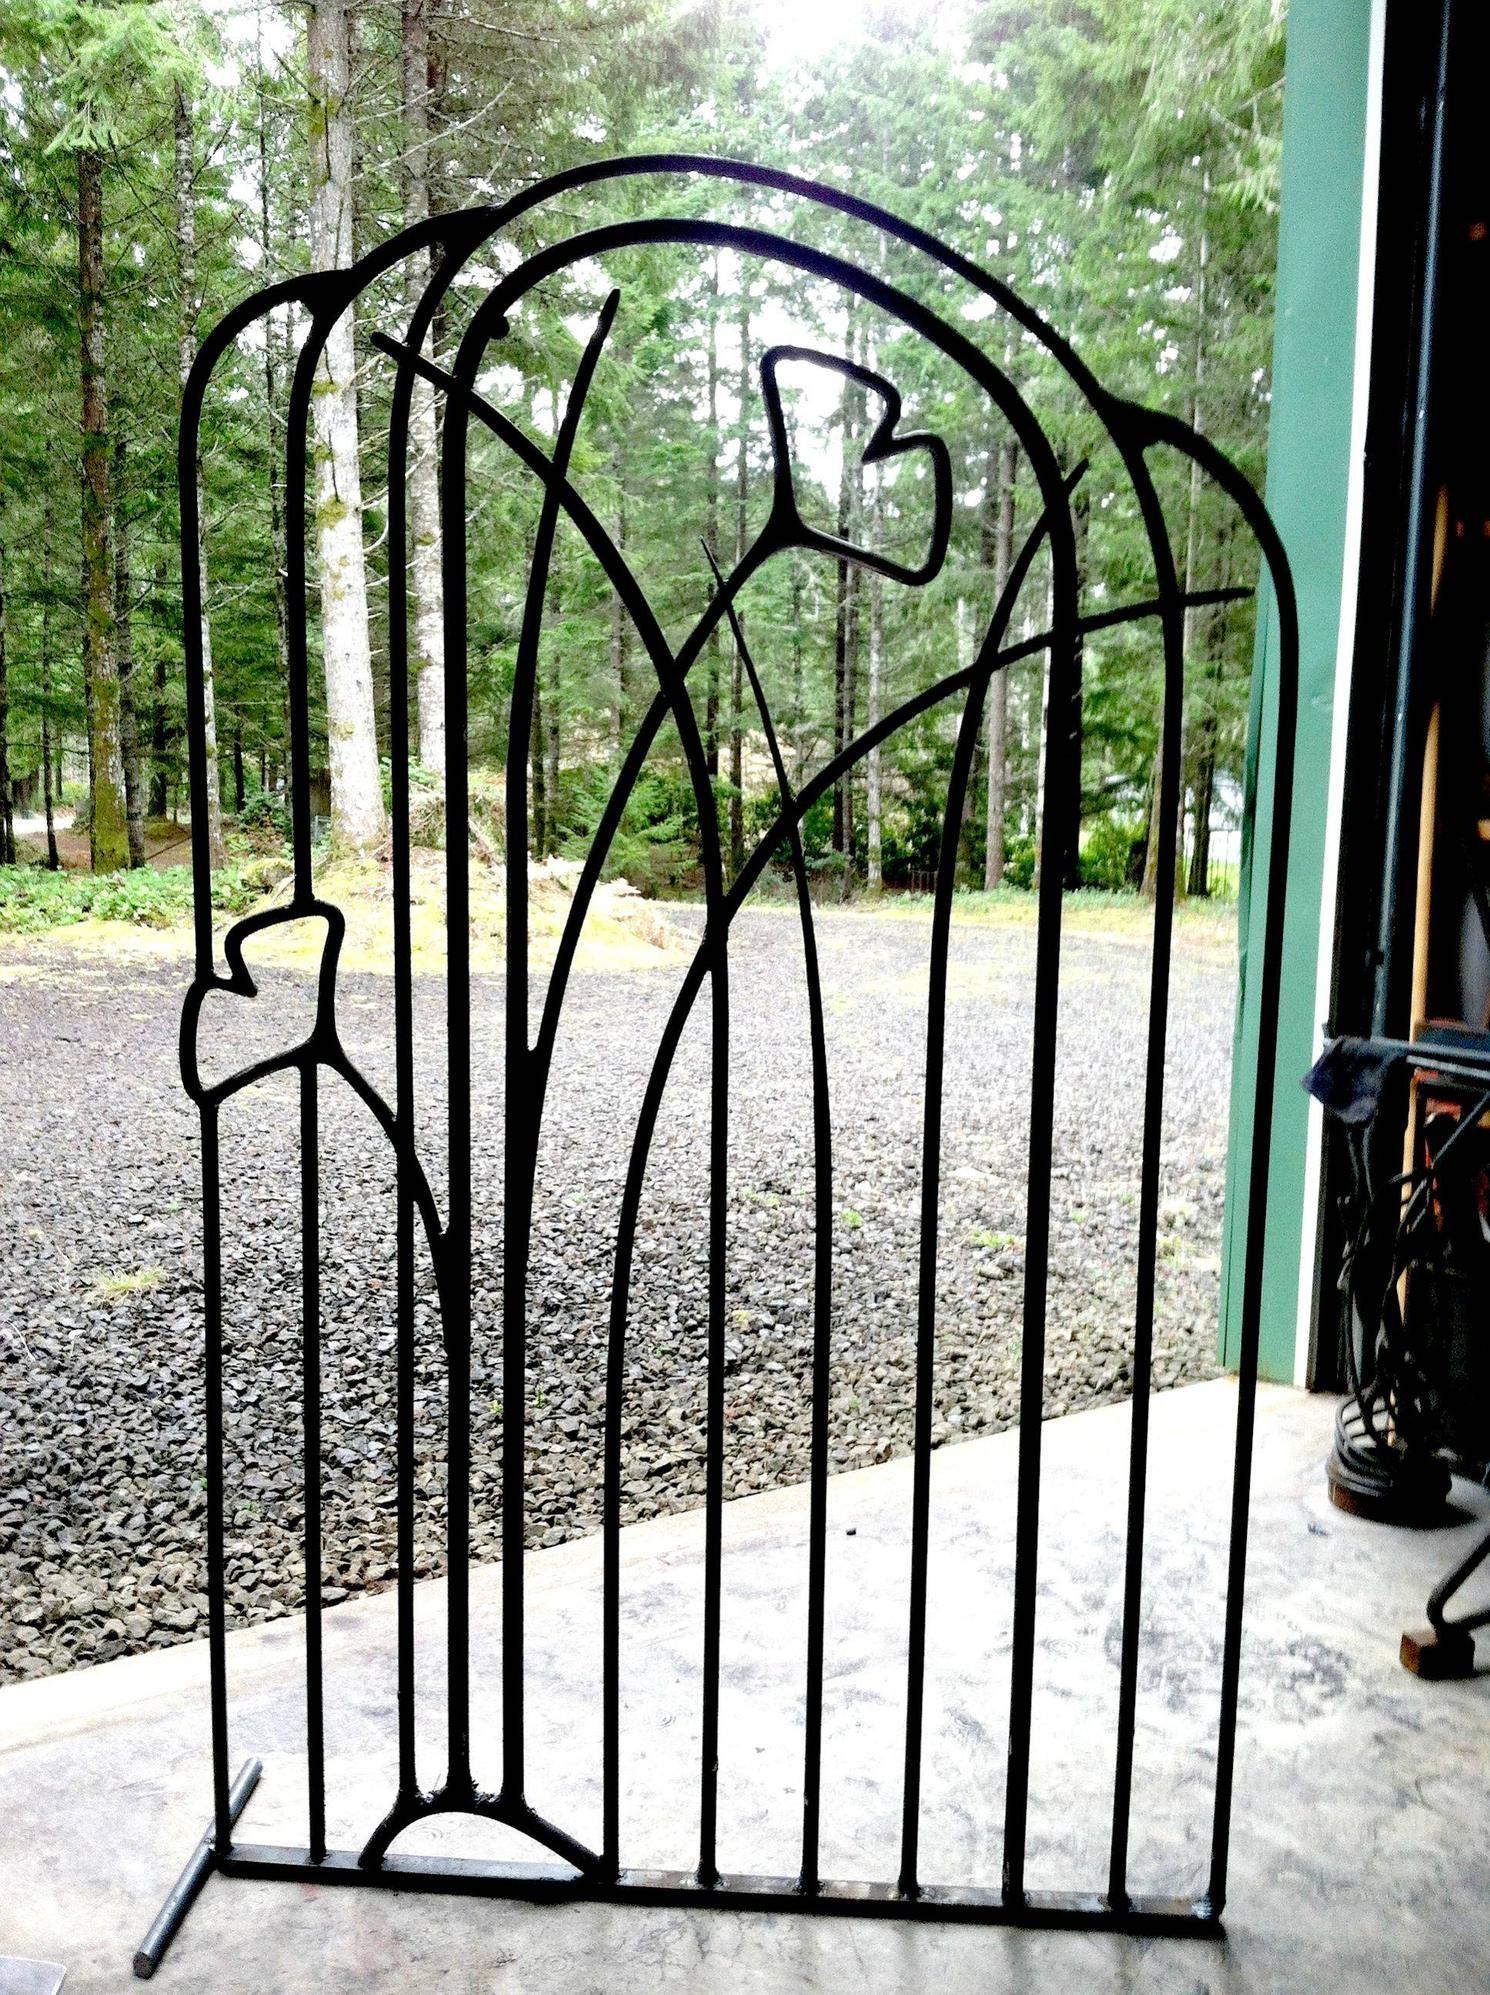 Garten Jugendstil ginkgo in the grass forged blacksmithing